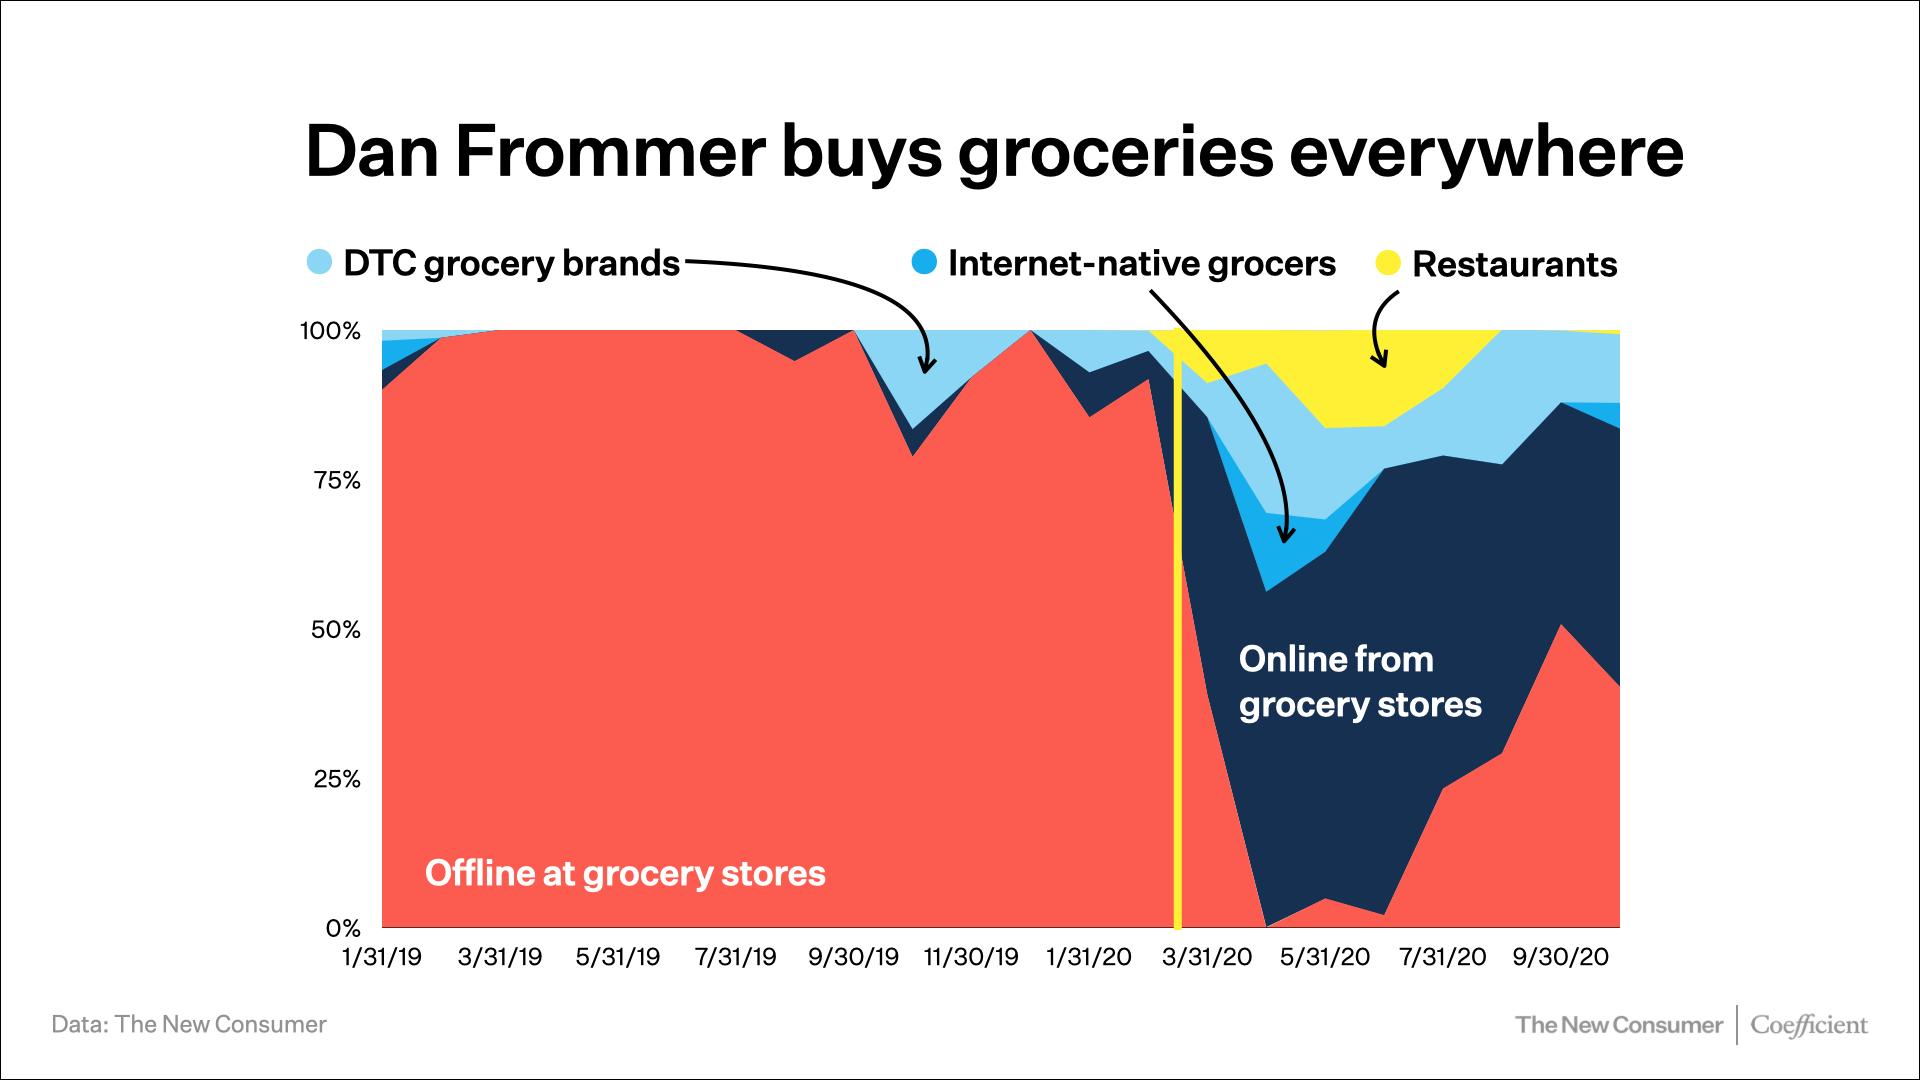 Dan Frommer grocery unbundling chart